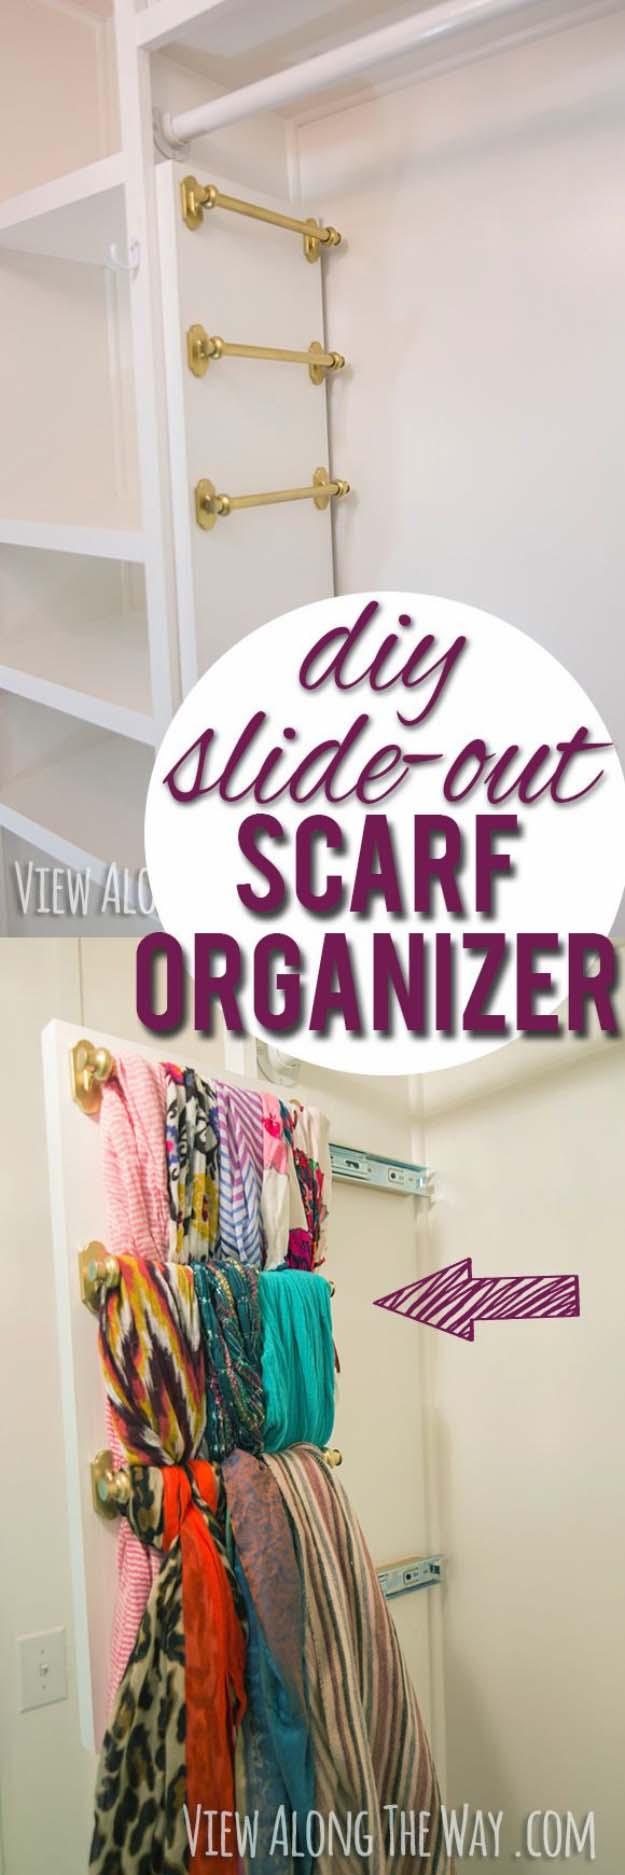 Wardrobe Closet Organization Small Spaces